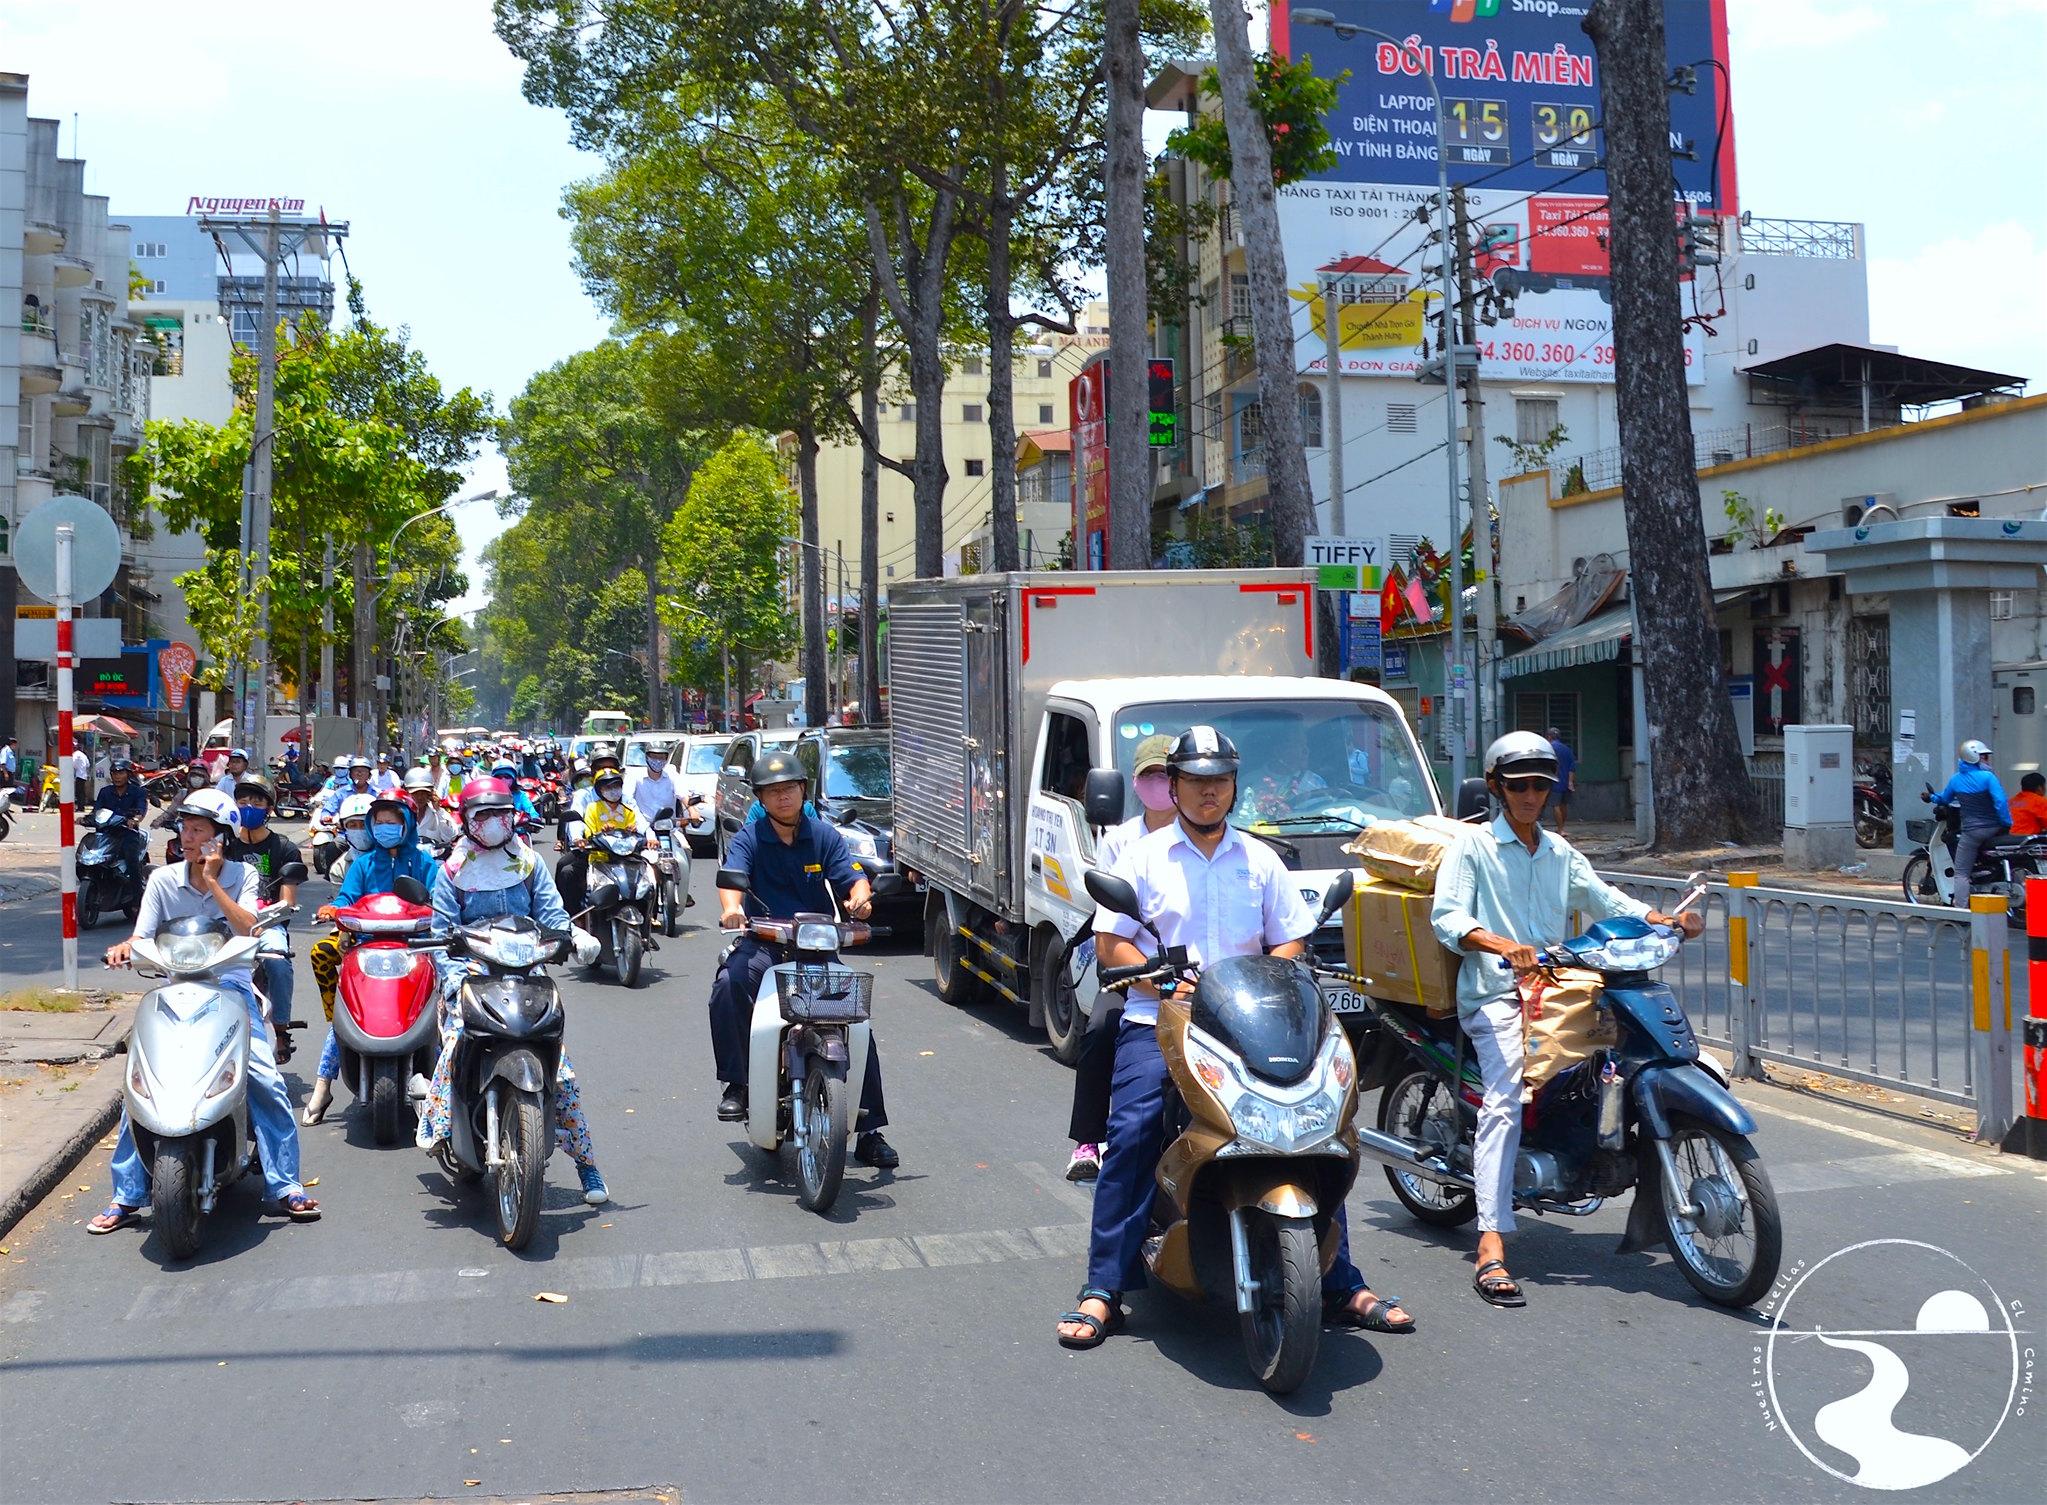 Trafico de Saigon